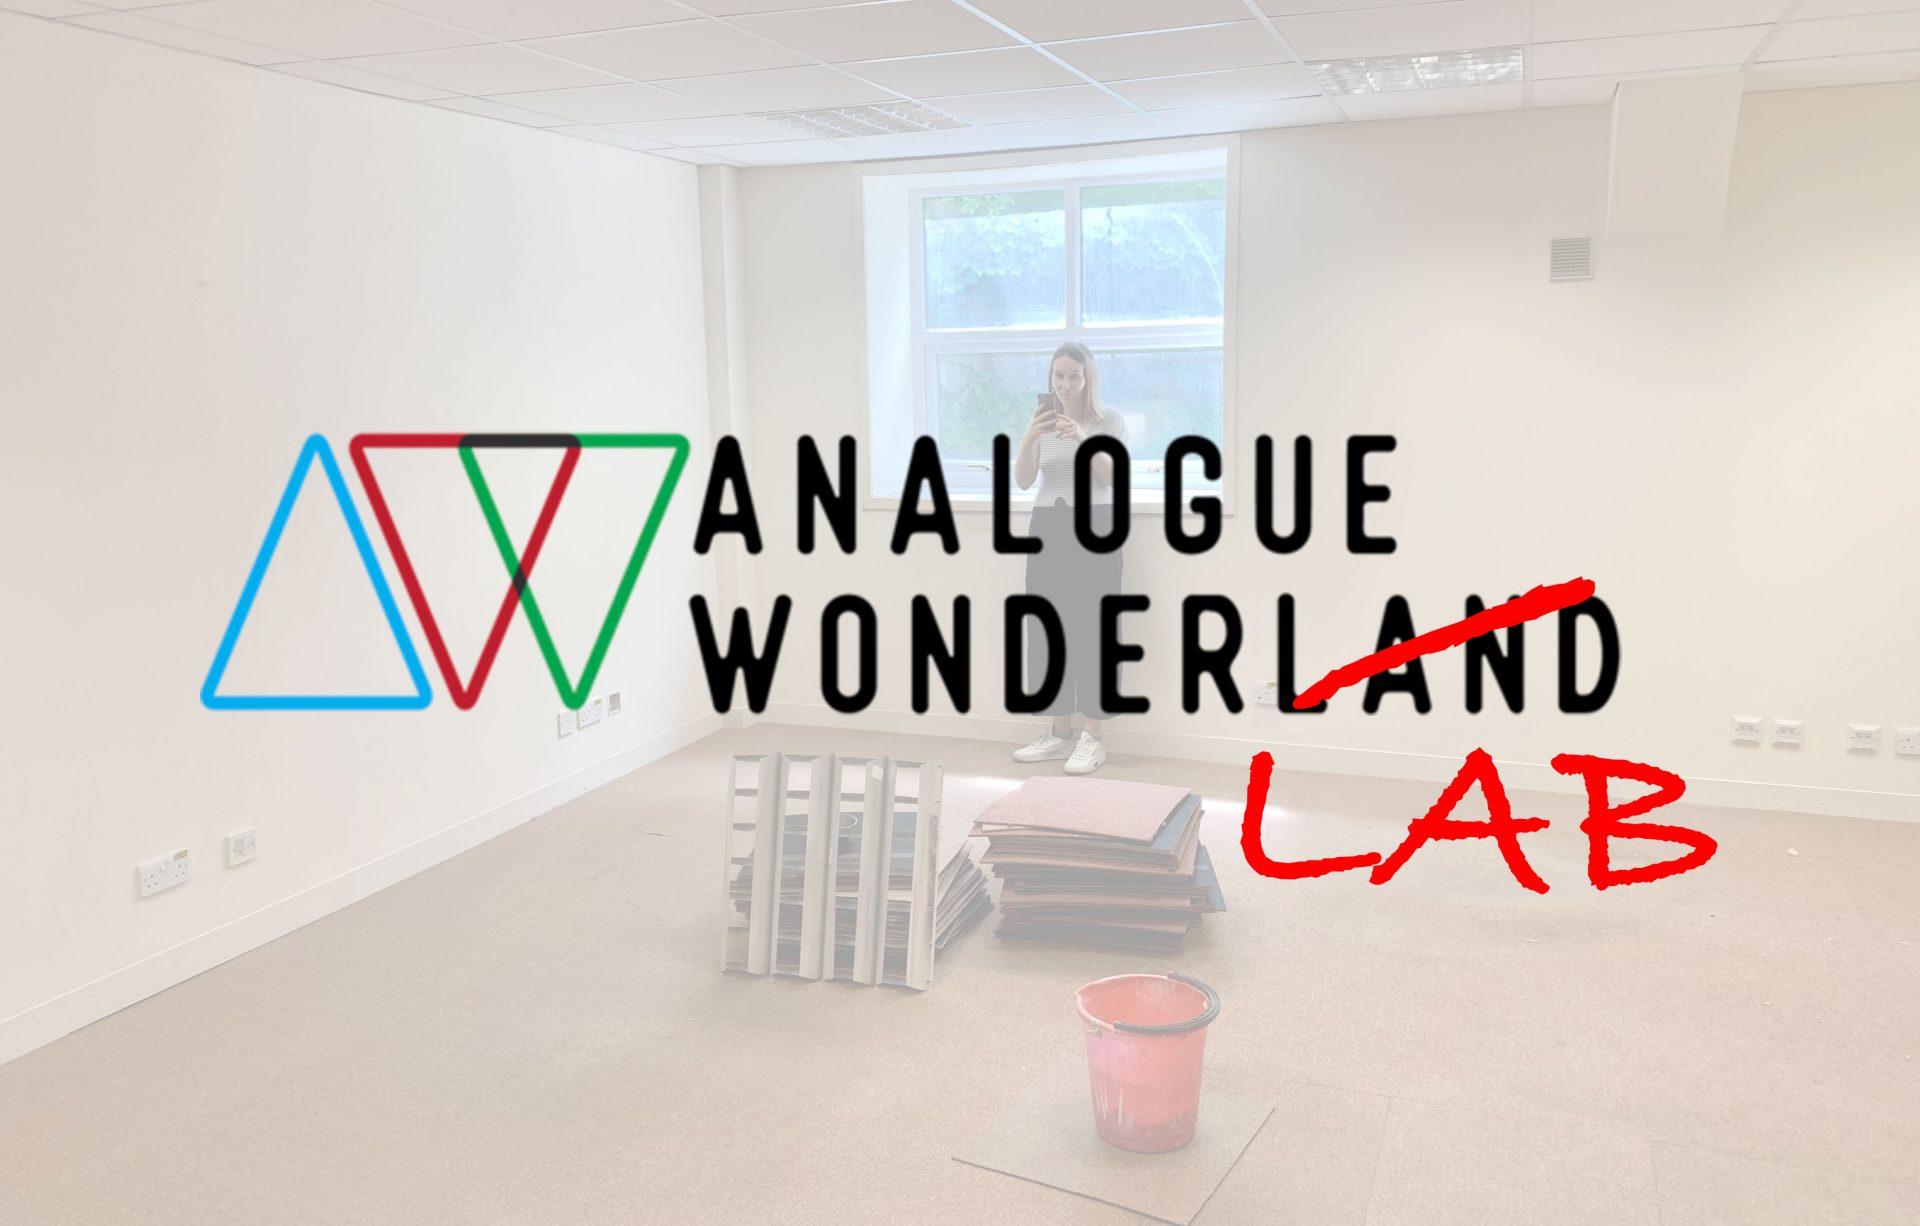 Analogue Wonderlab graphic (Pic: Analogue Wonderland)